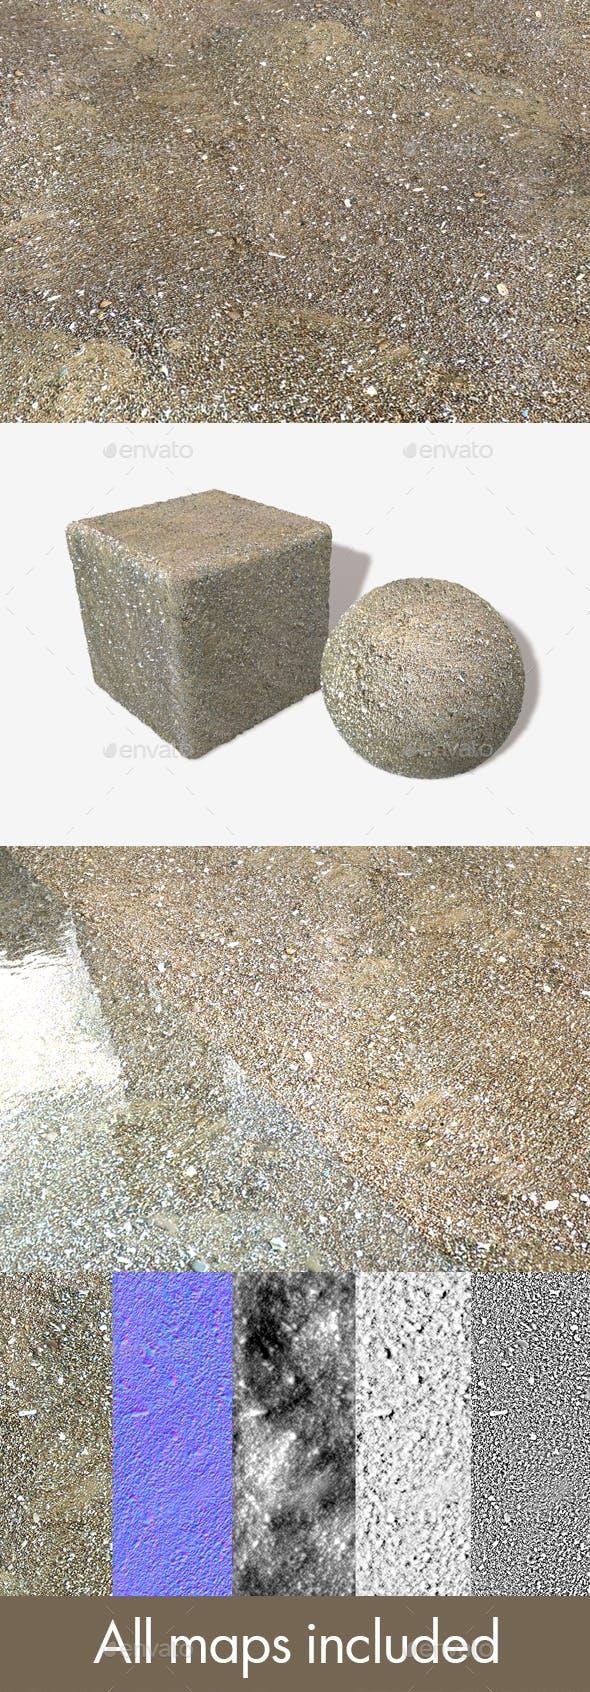 Damp Beach Seamless Texture - 3DOcean Item for Sale